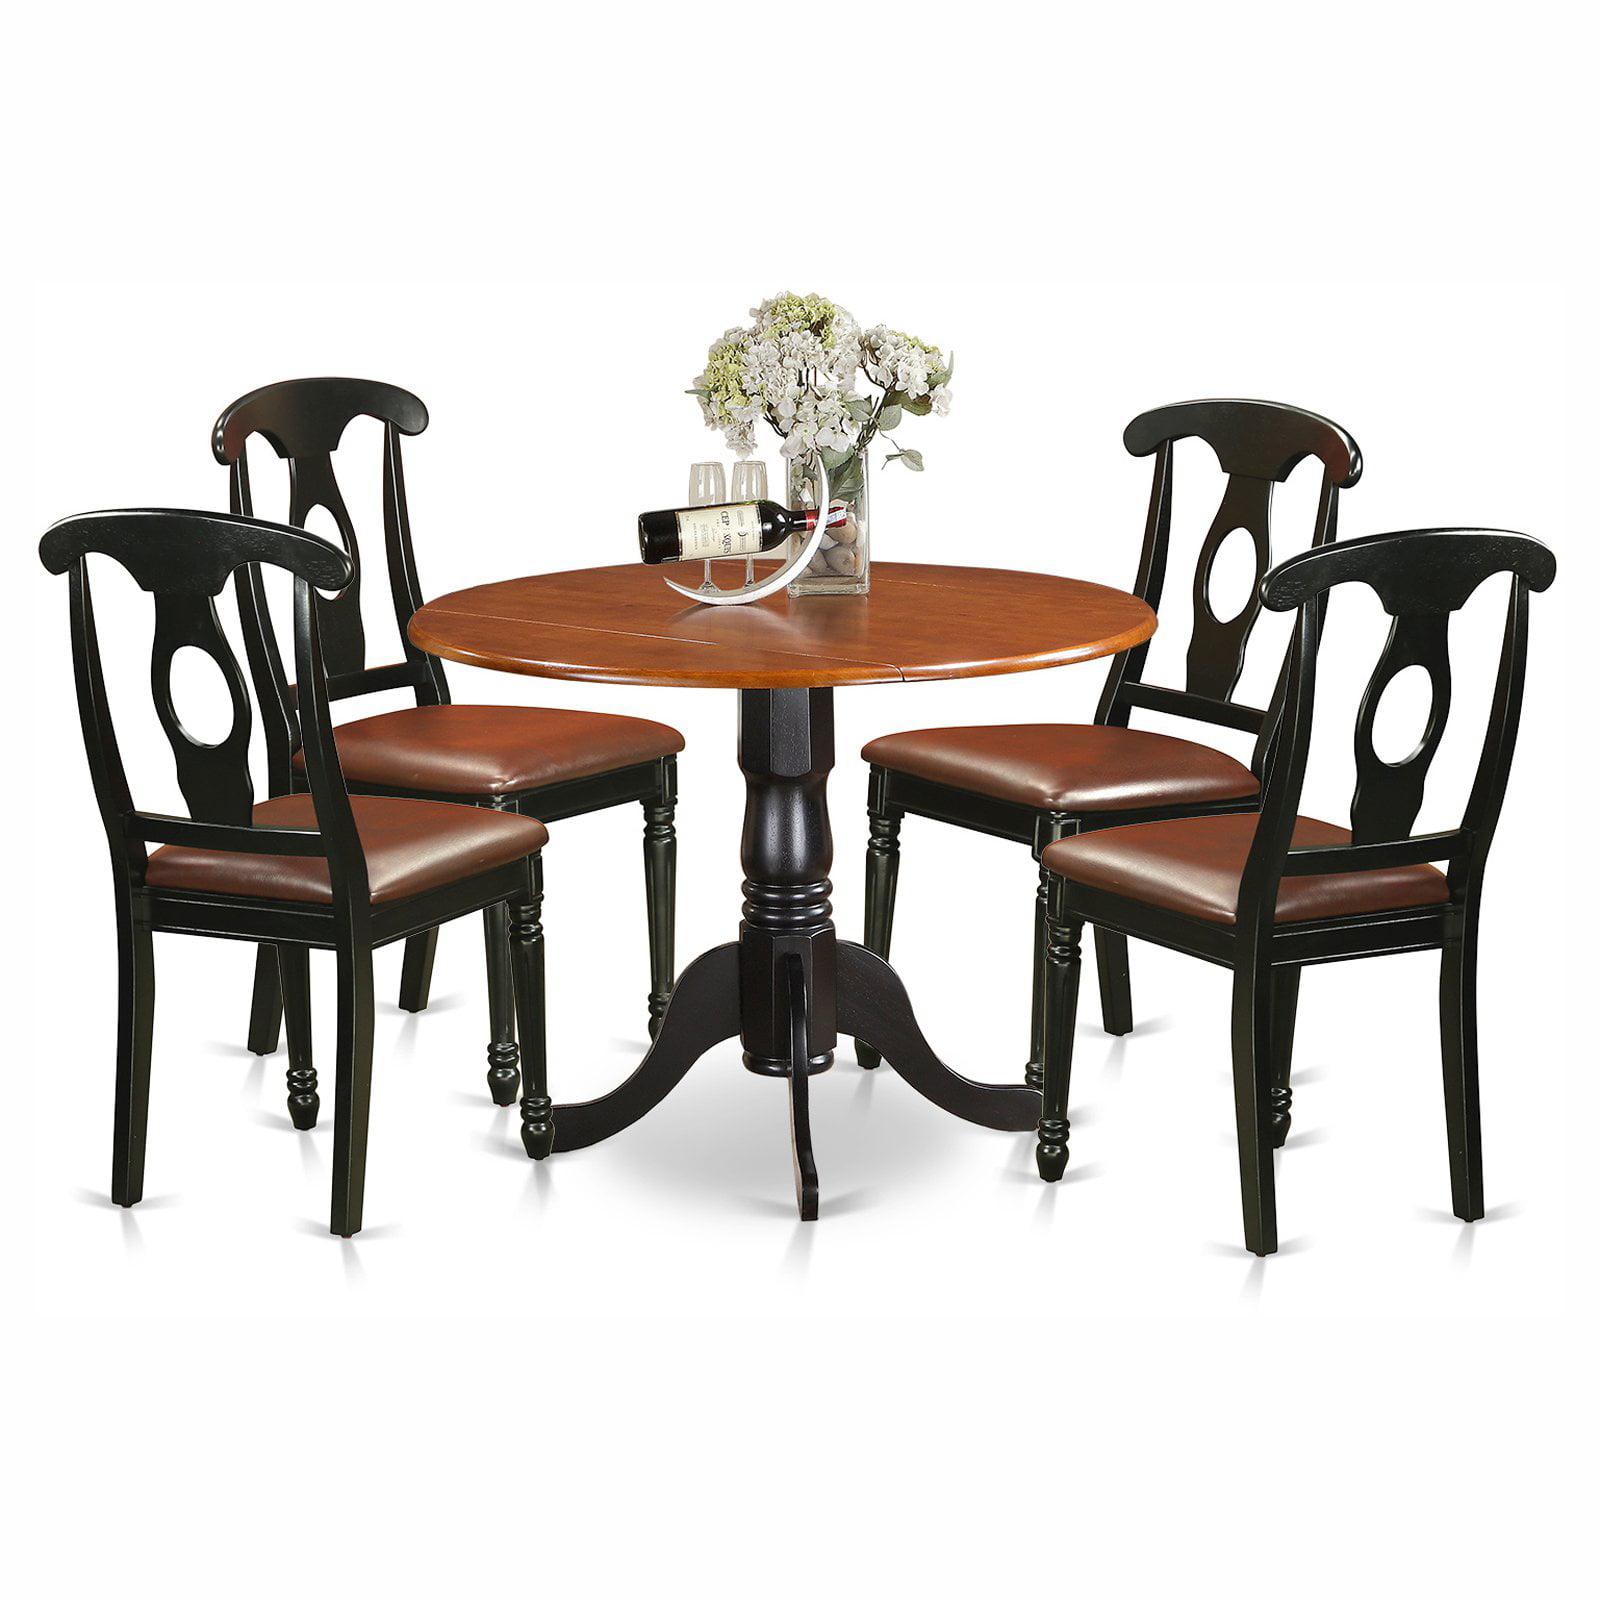 East West Furniture Dublin 5 Piece Drop Leaf Dining Table